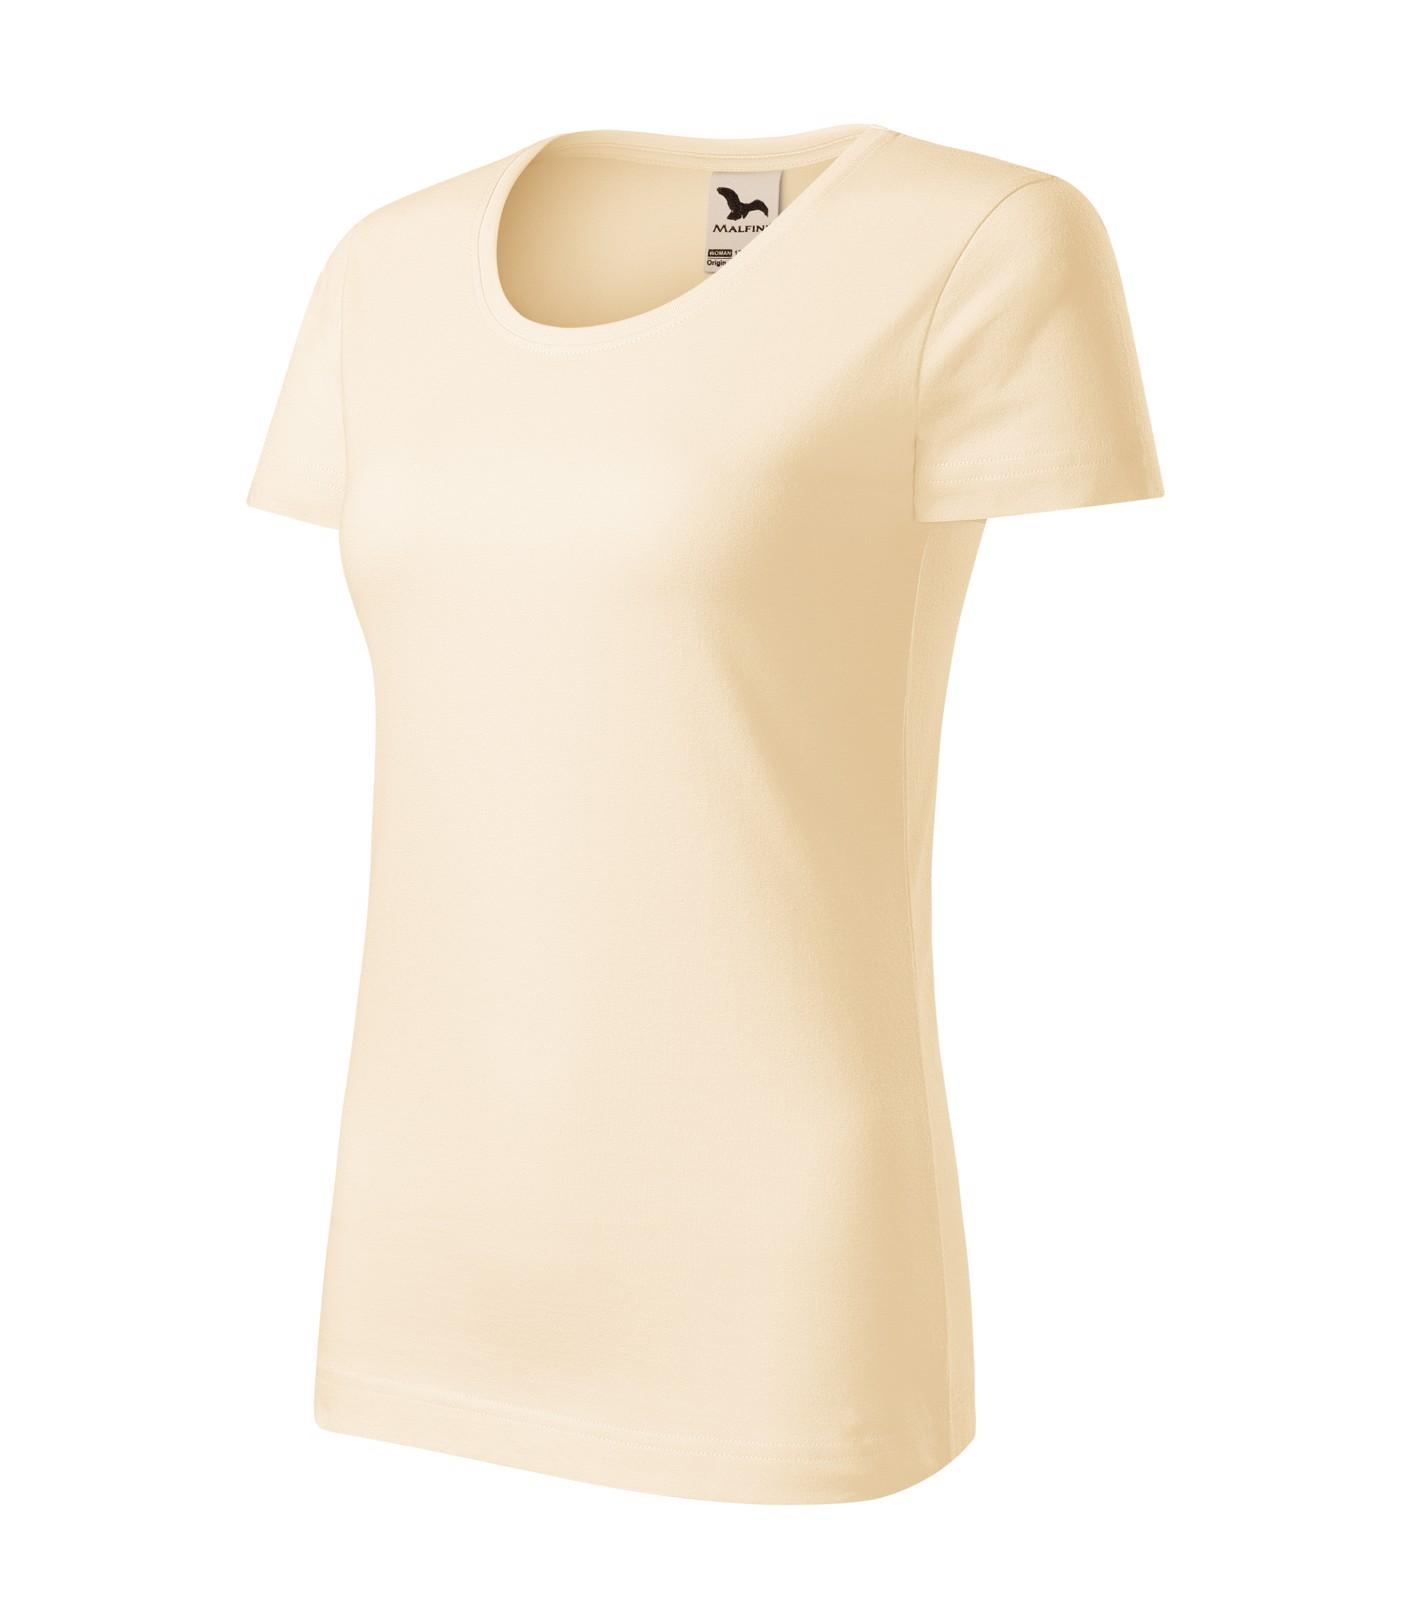 T-shirt women's Malfini Origin - Almond / 2XL